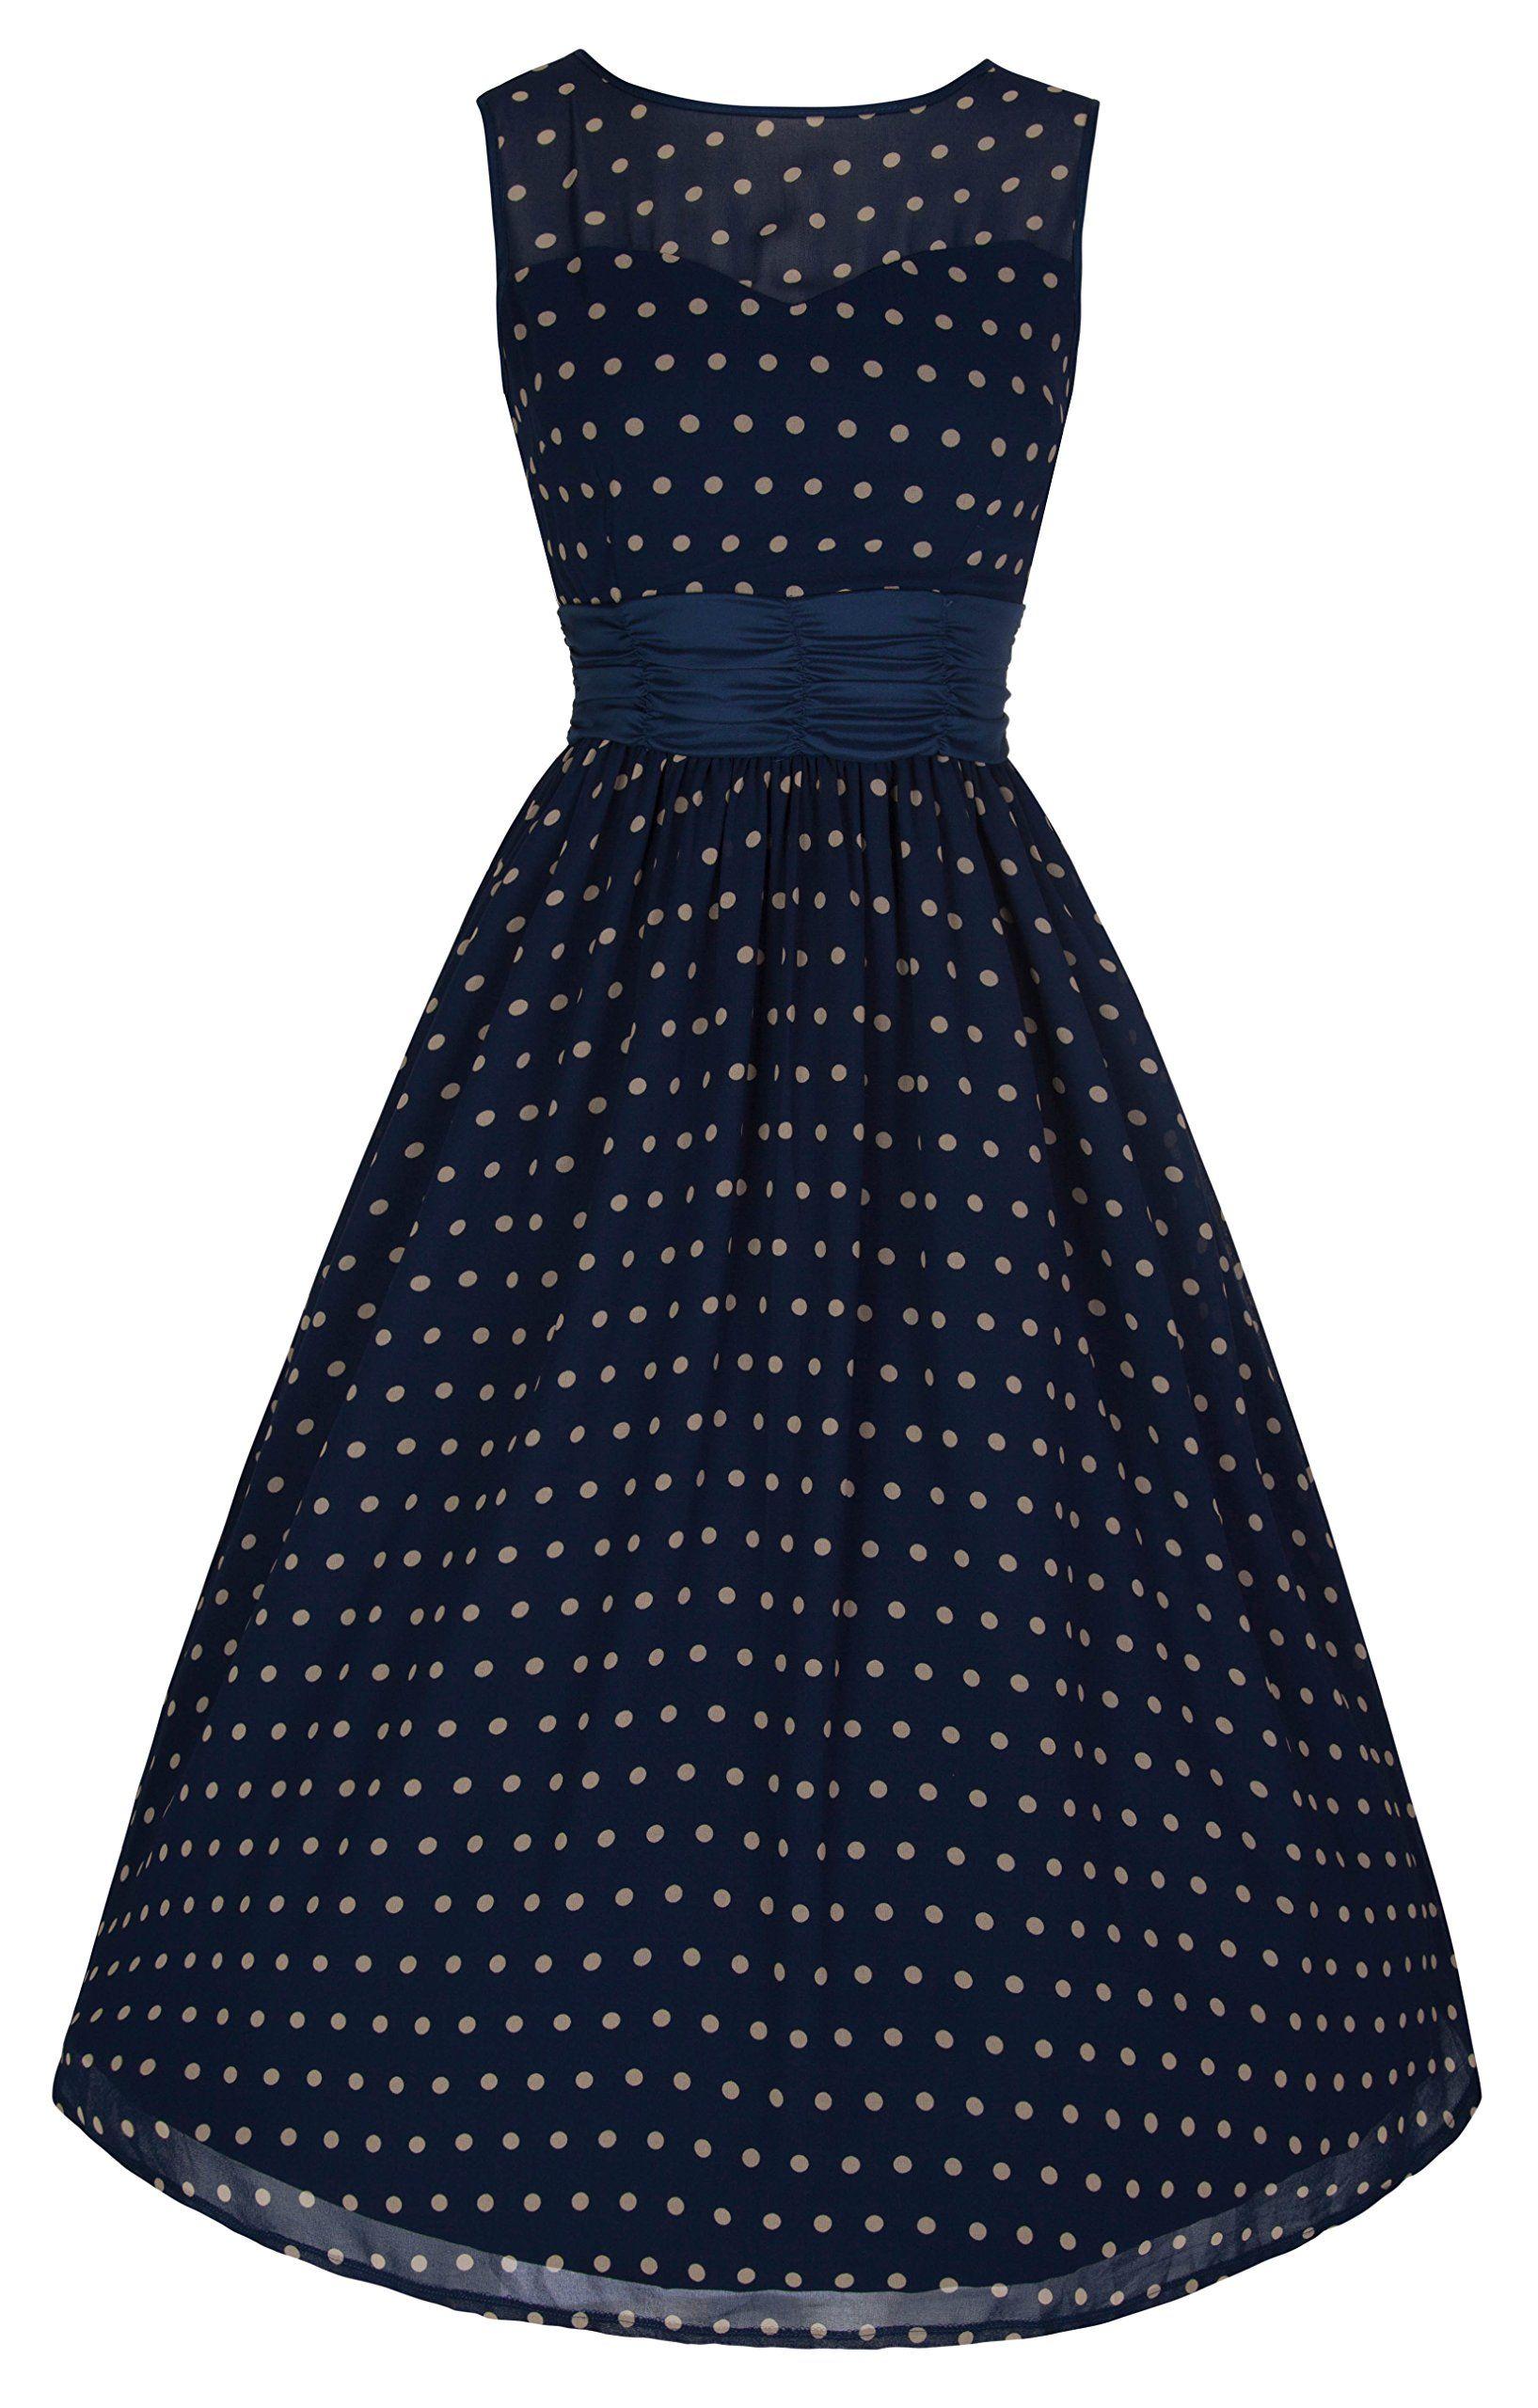 Lindy Bop Cindy Vintage 50 S Classy Yet Sassy Polka Dot Party Dress At Amazon Women S Clothing Store Dresses Party Dress Womens Midi Dresses [ 2560 x 1635 Pixel ]